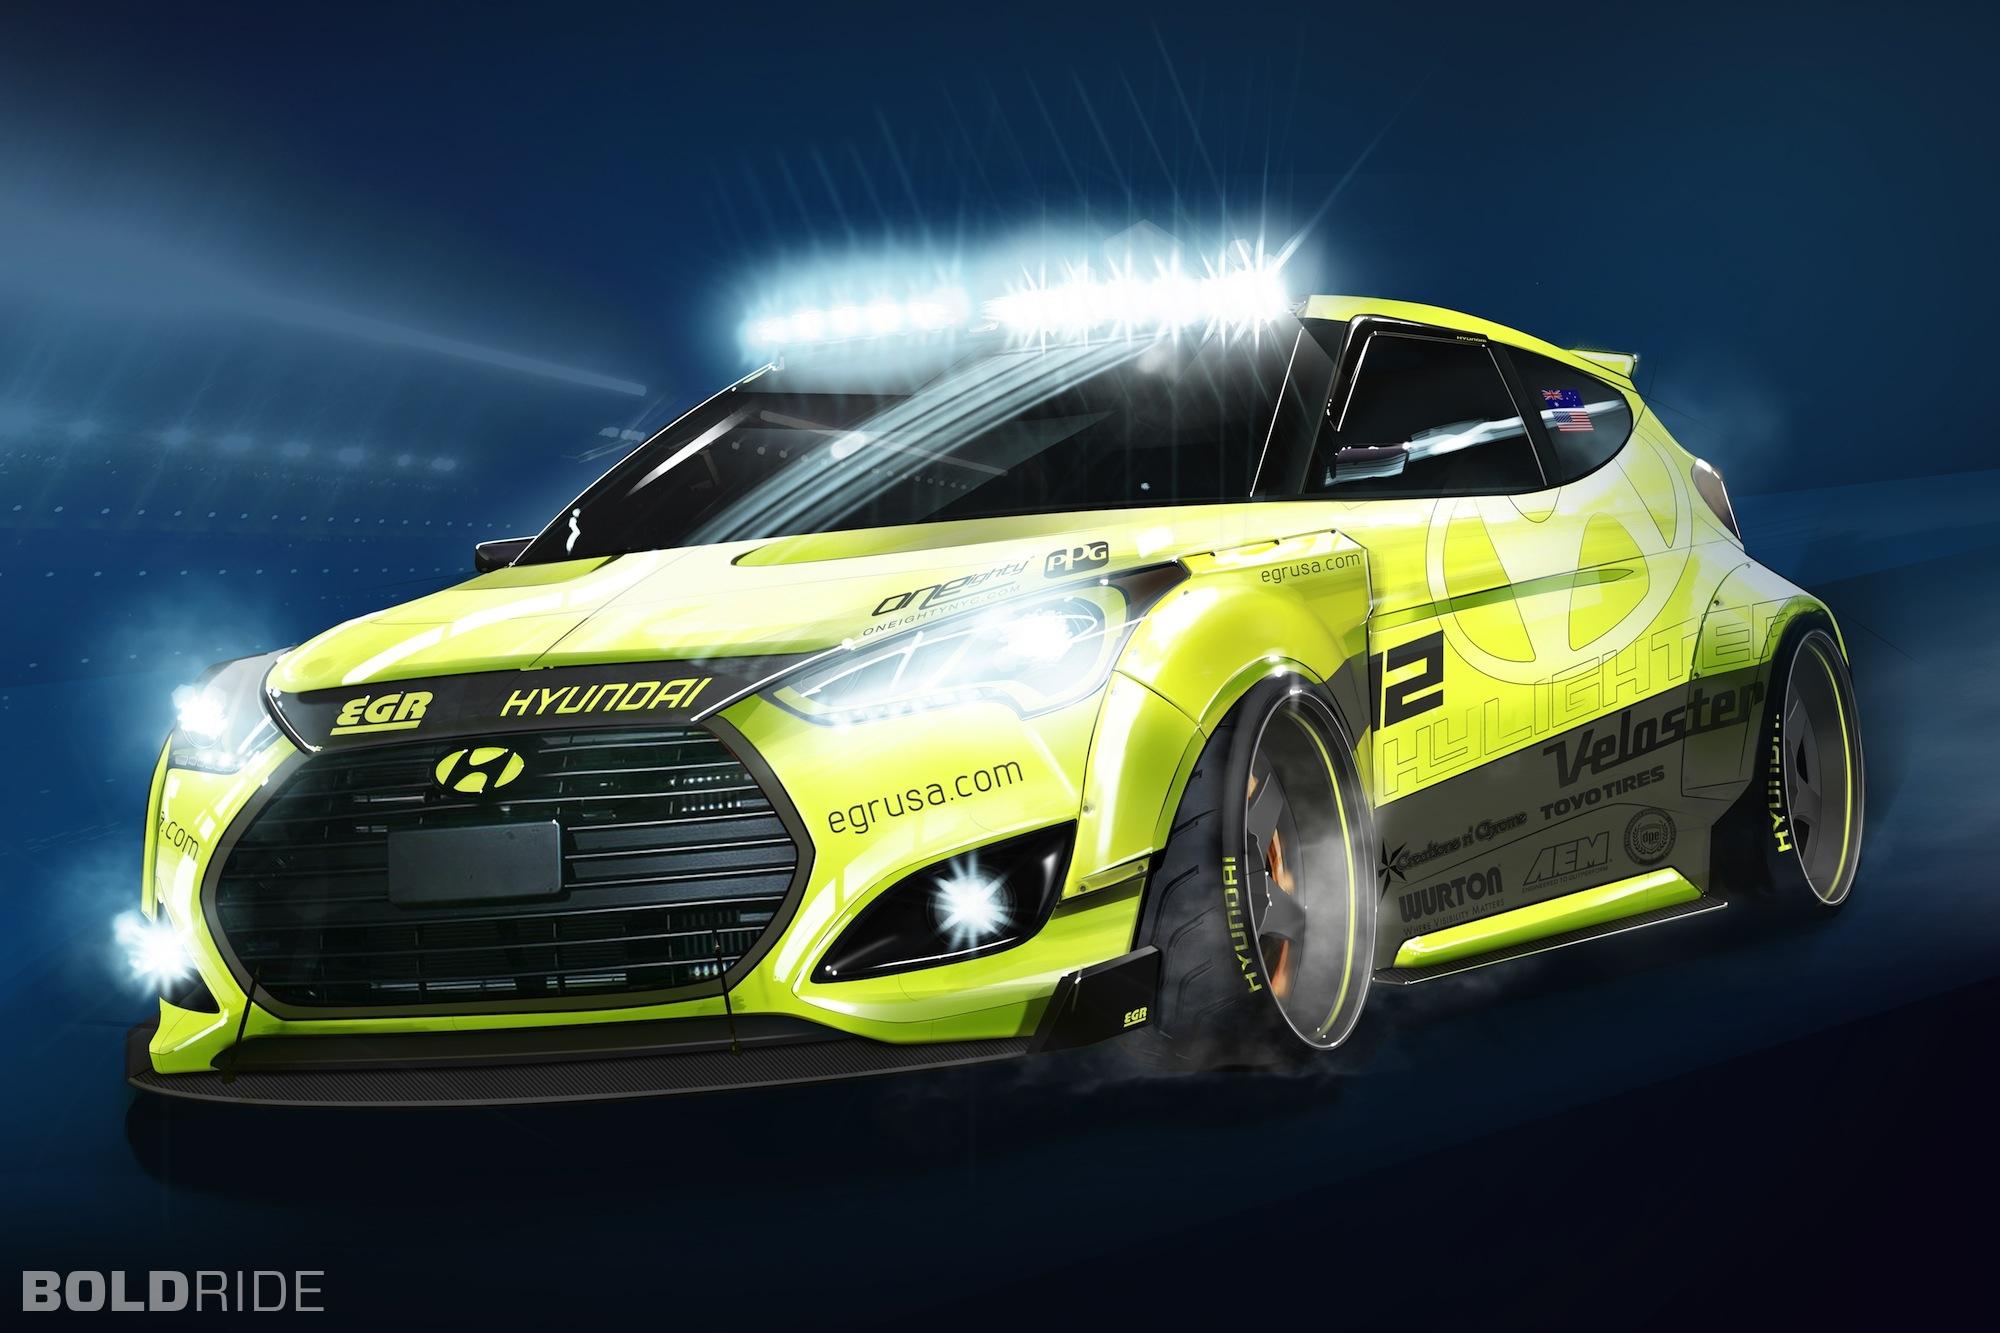 2013 hyundai veloster turbo yellowcake night racer concept. Black Bedroom Furniture Sets. Home Design Ideas